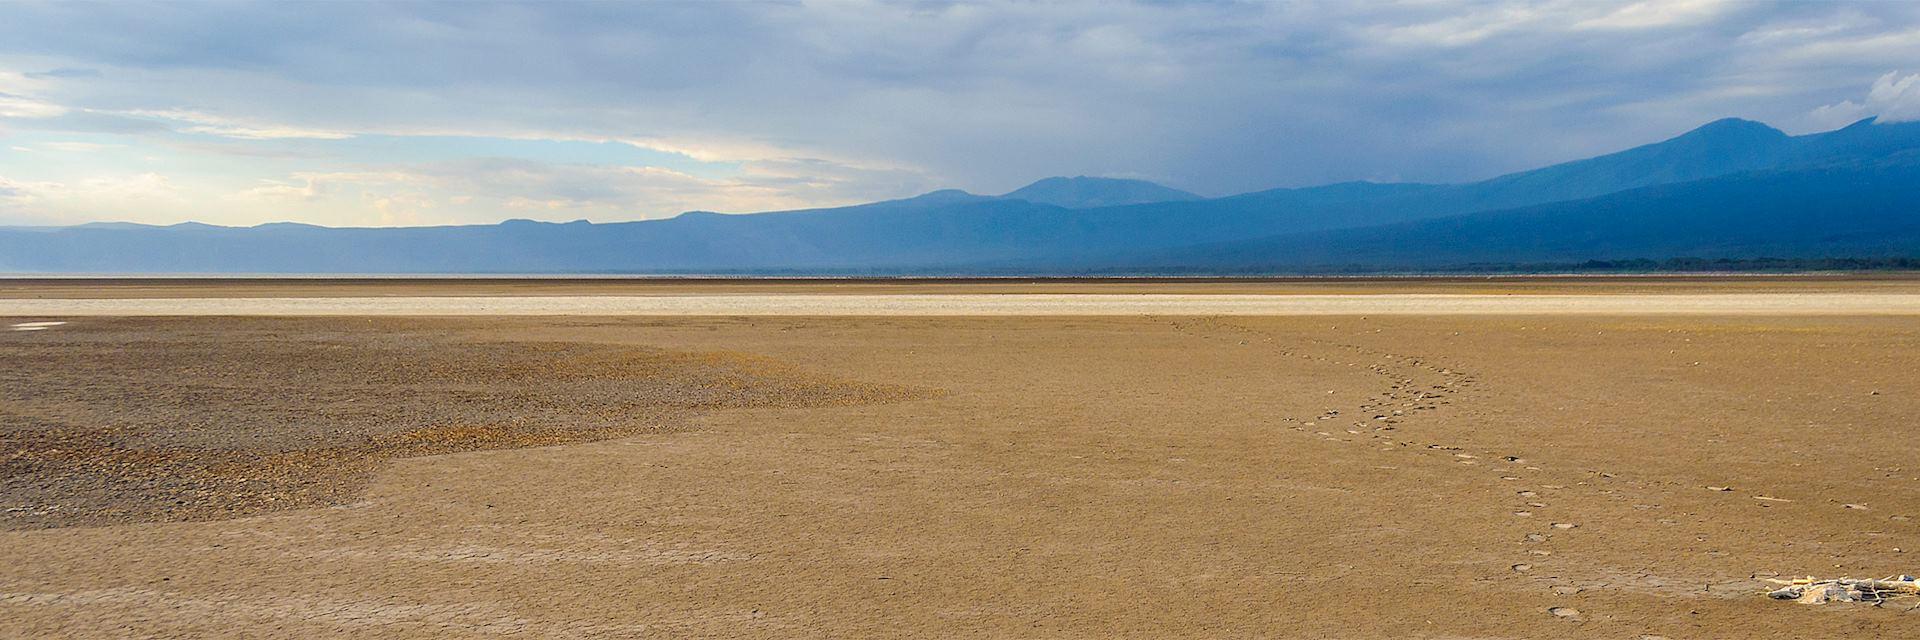 Lake Eyasi, Tanzania